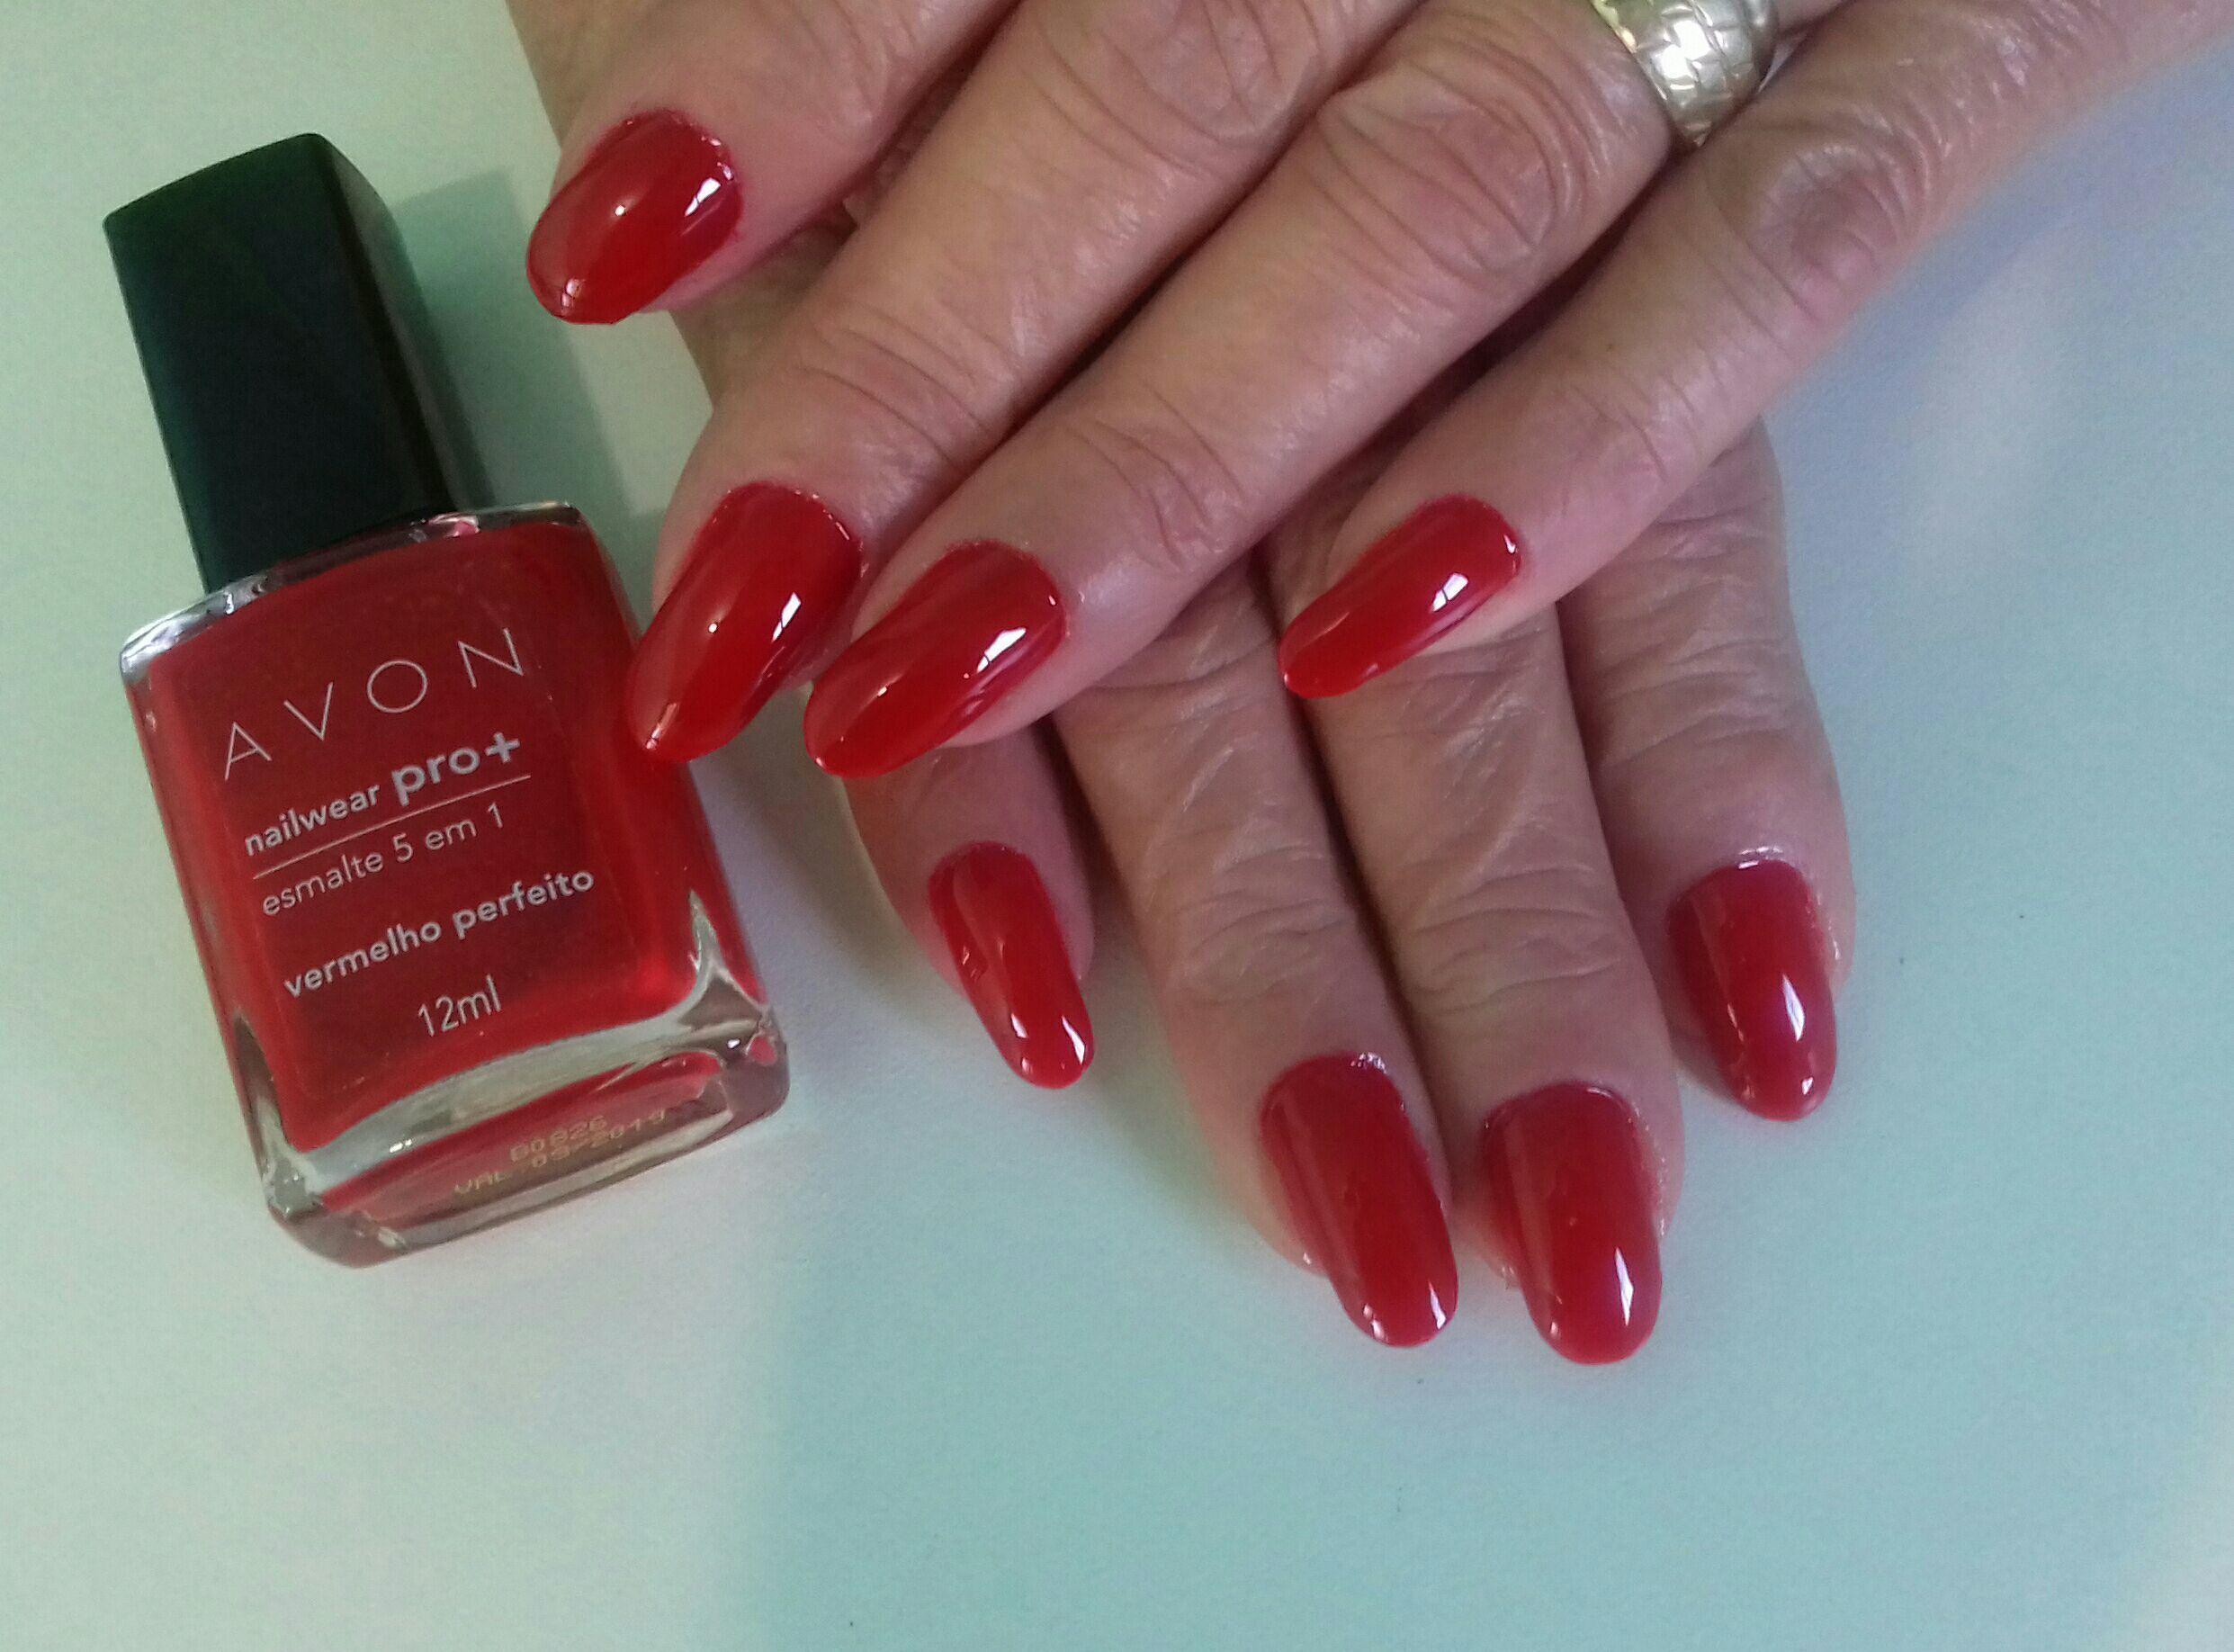 #unhaslinda #avon #esmaltadas unha manicure e pedicure manicure e pedicure